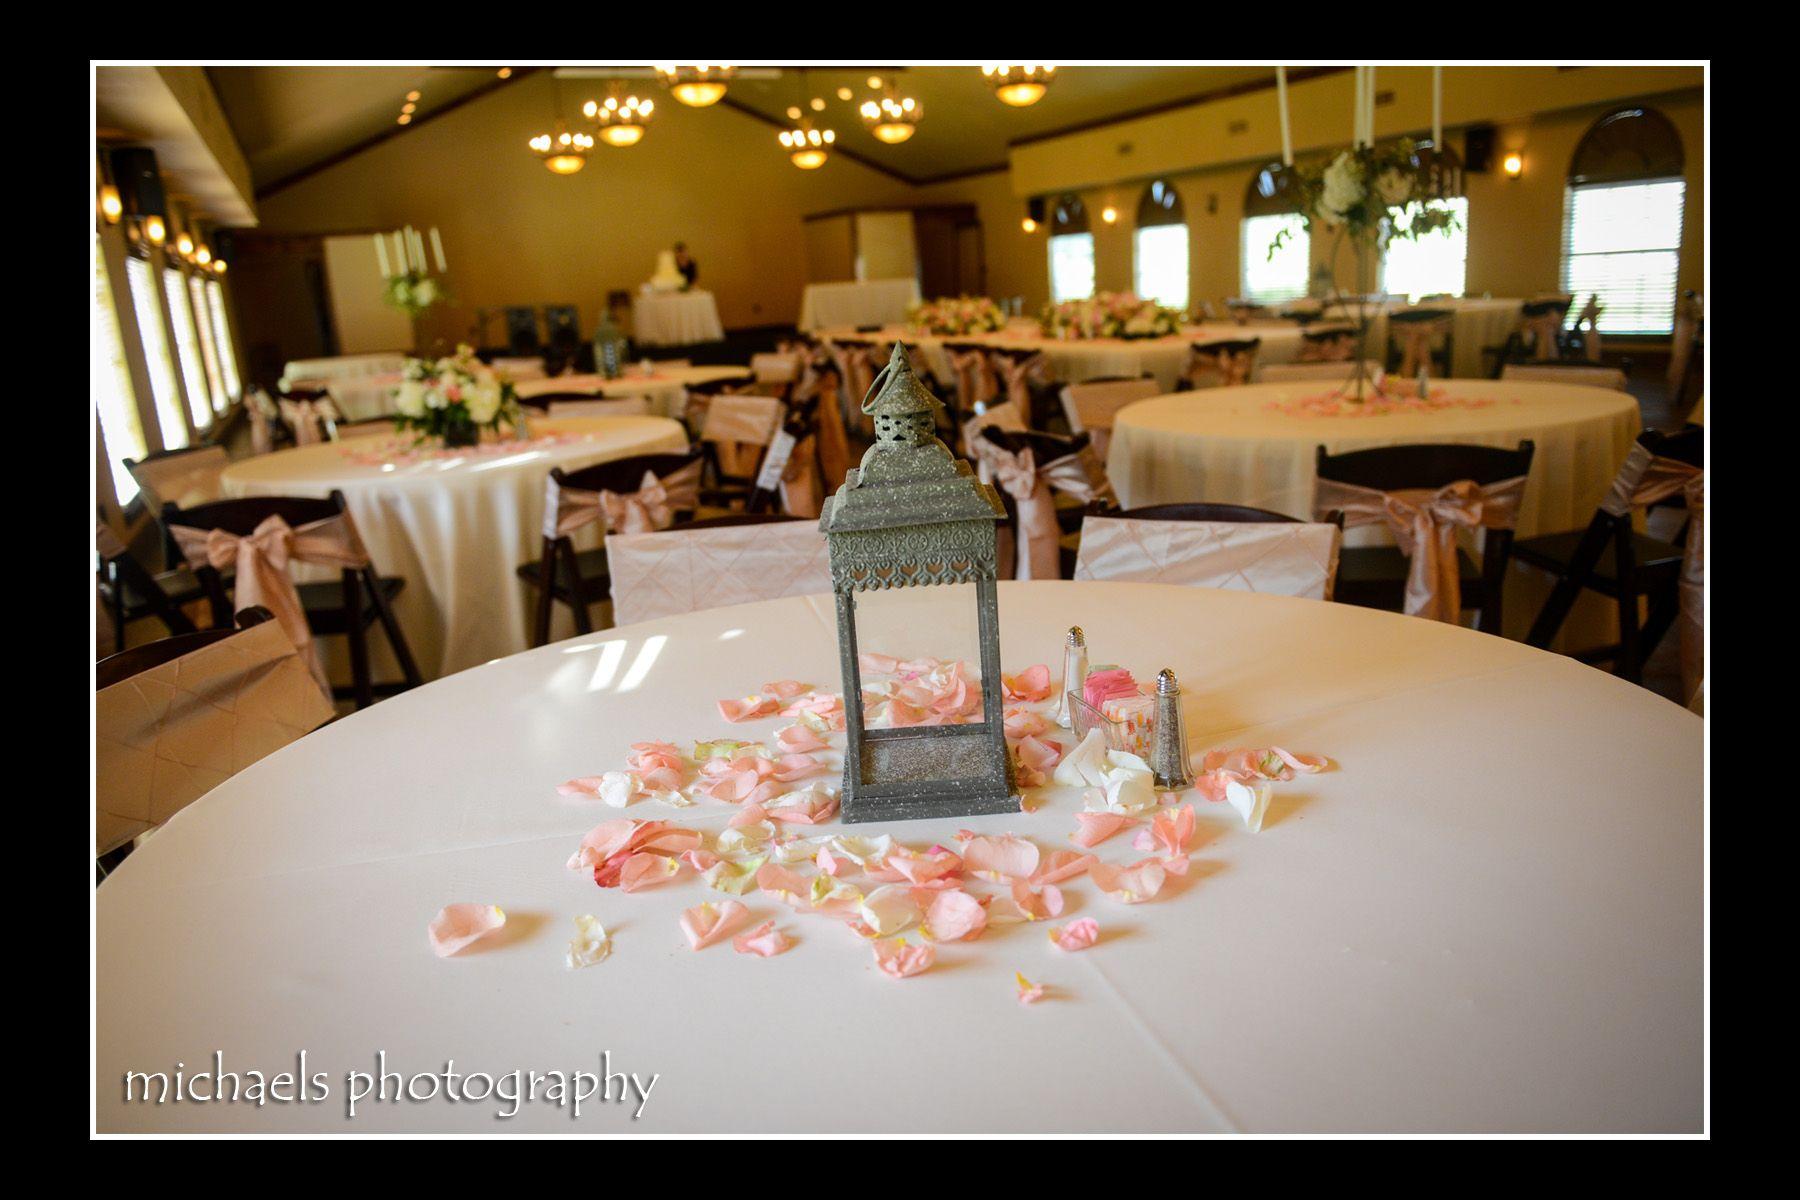 Decor By A 1 Wedding Party Rentals Wedding Table Decor Lantern Rose Petals Shabb Wedding Rentals Decor Shabby Chic Wedding Vintage Shabby Chic Wedding